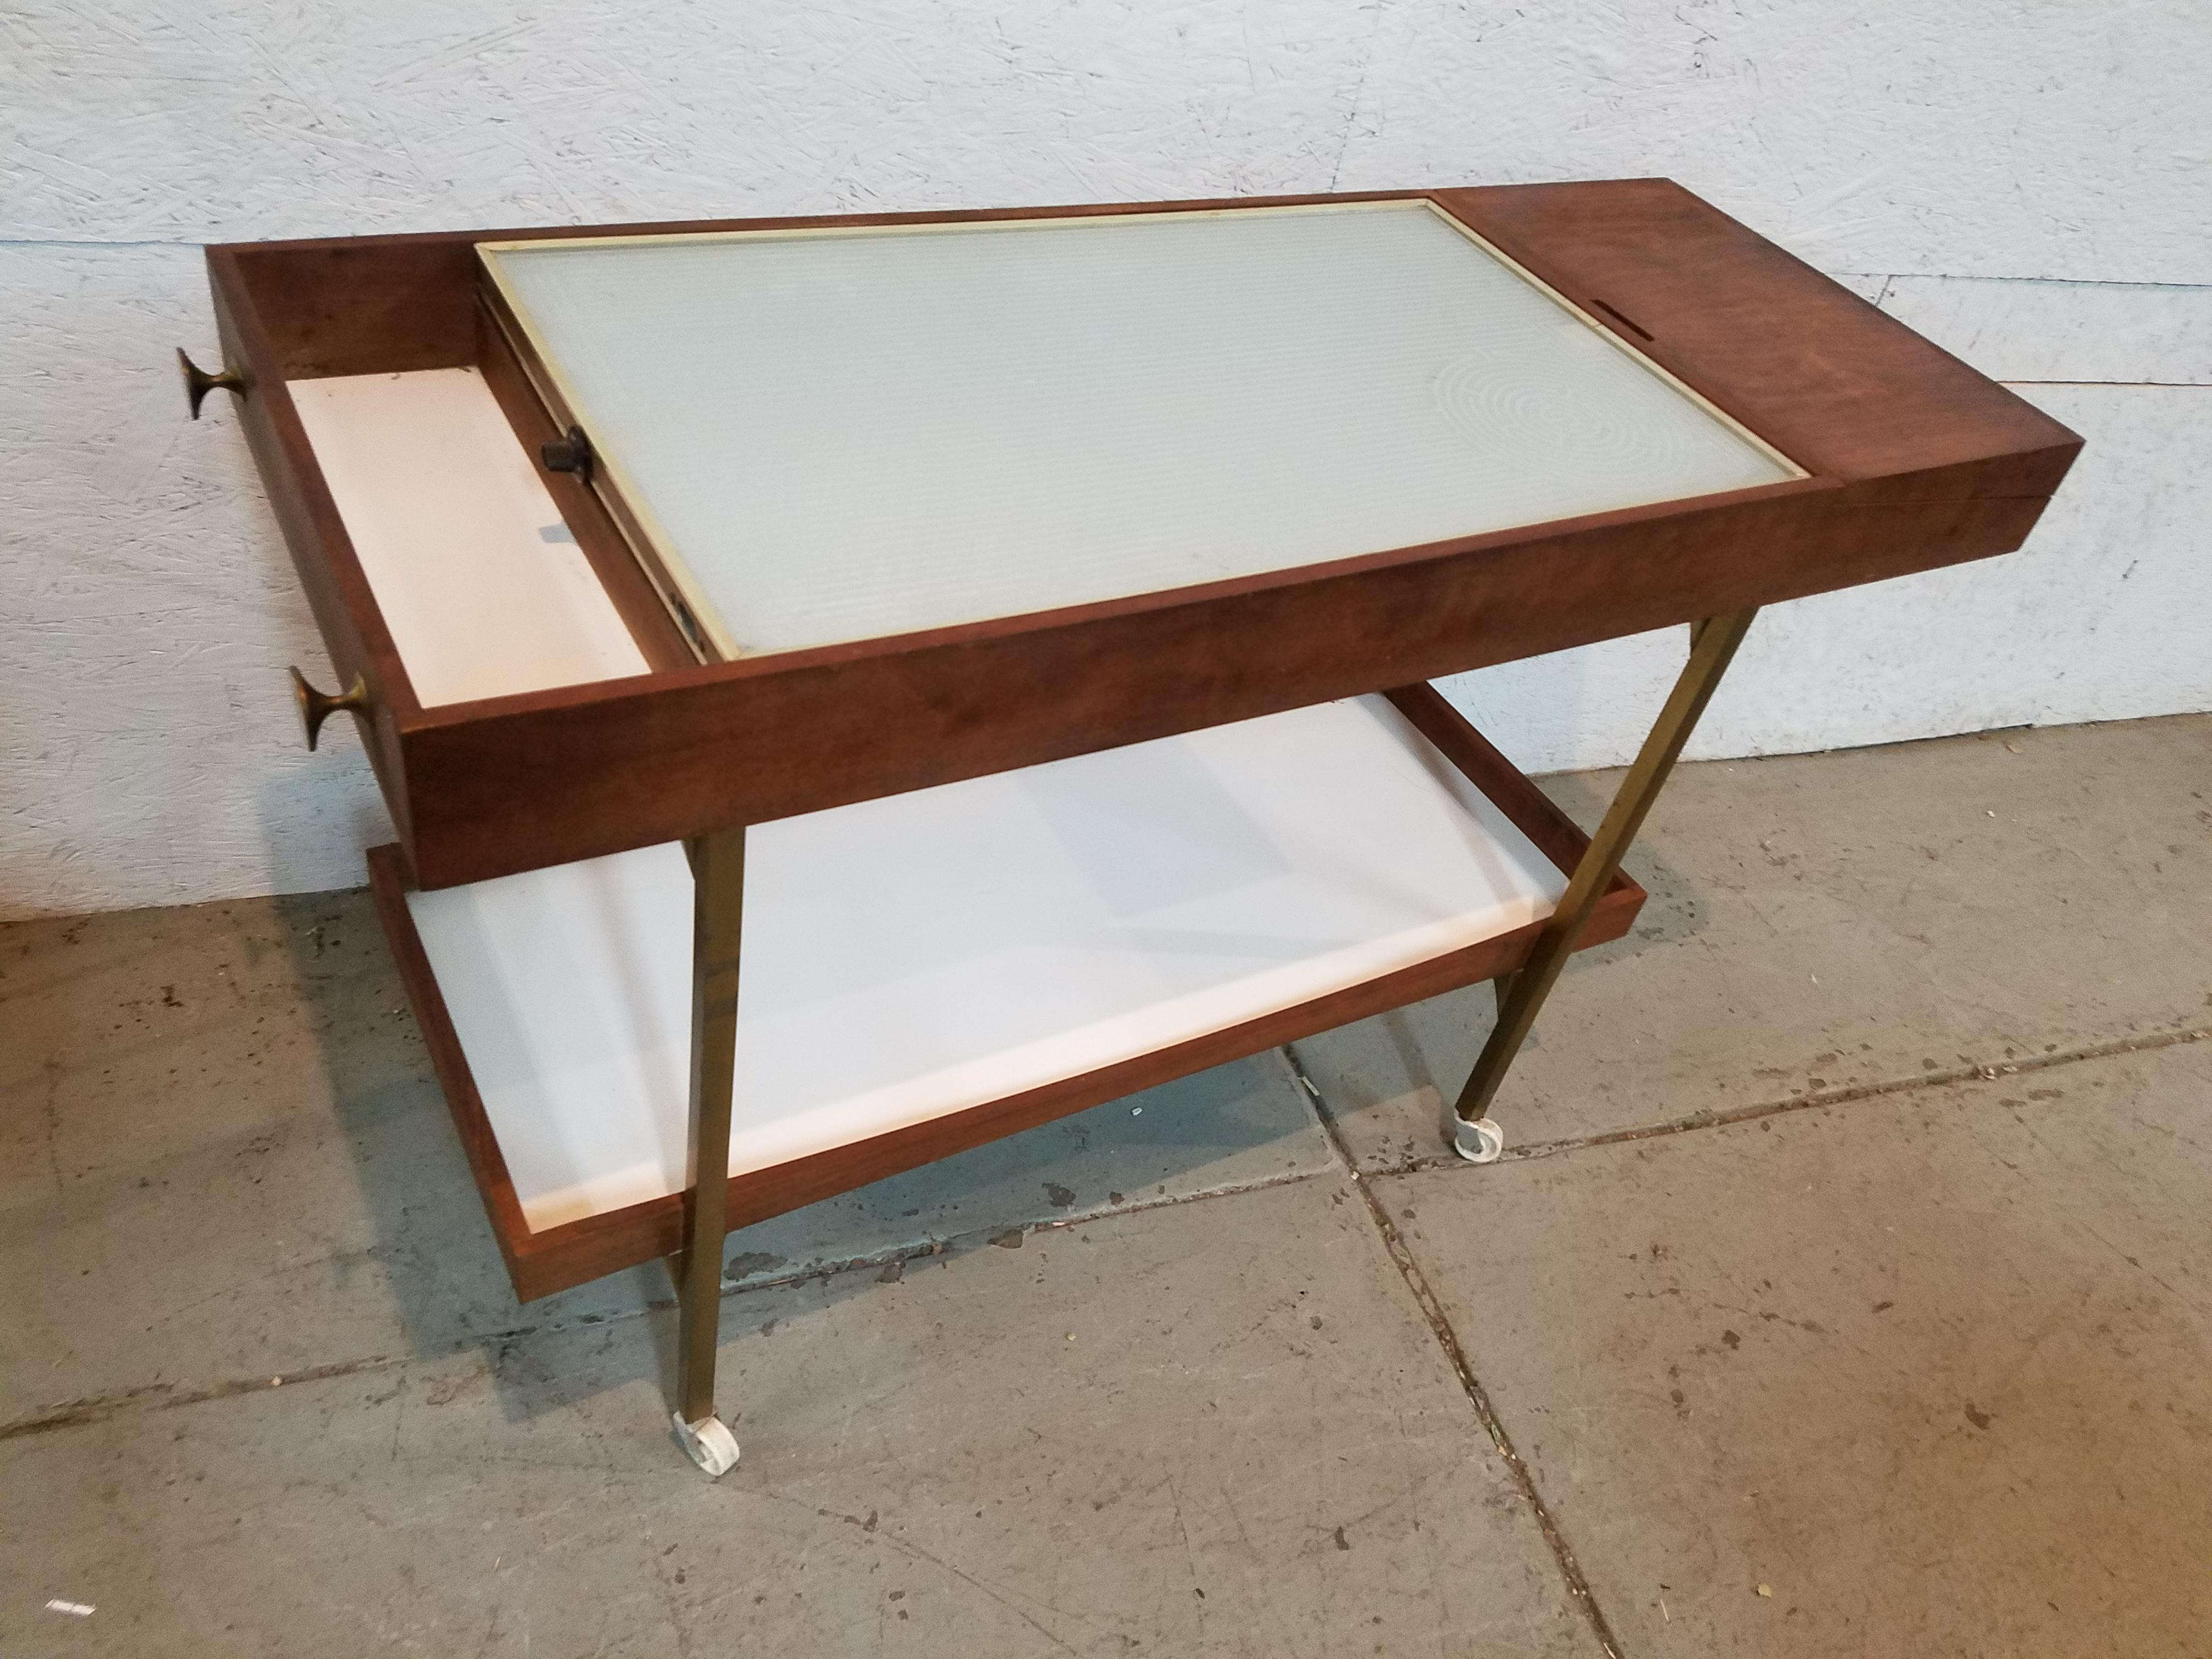 mid century modern salton serving cart with warming tray